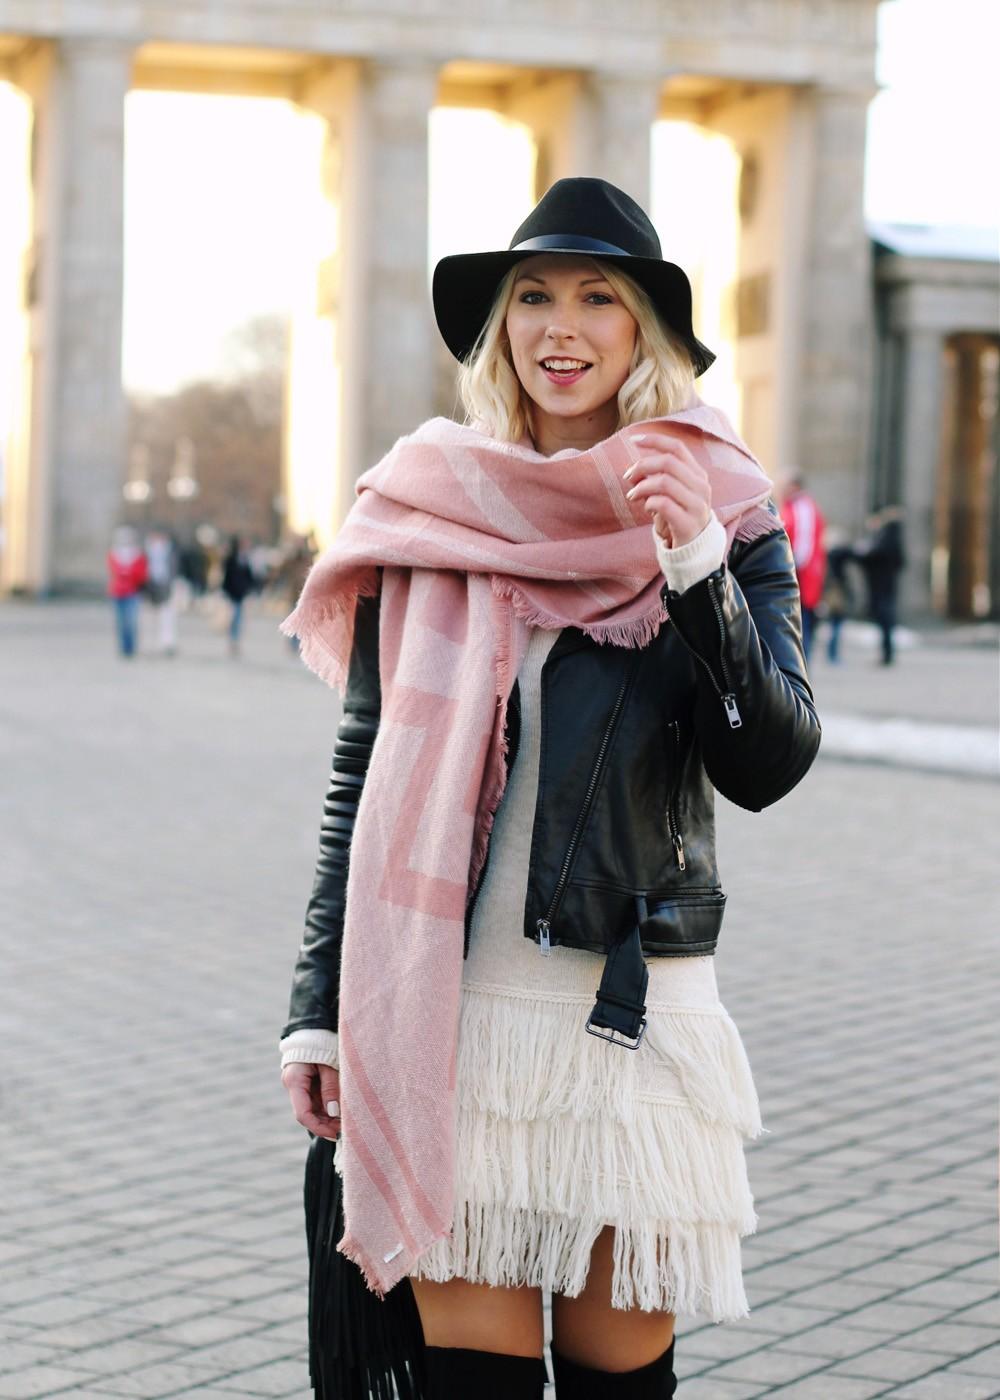 Fashion Week Berlin 2016 Outfit OOTD Fransen Strickkleid Lederjacke Overknees Schal Hut Fransentasche 18